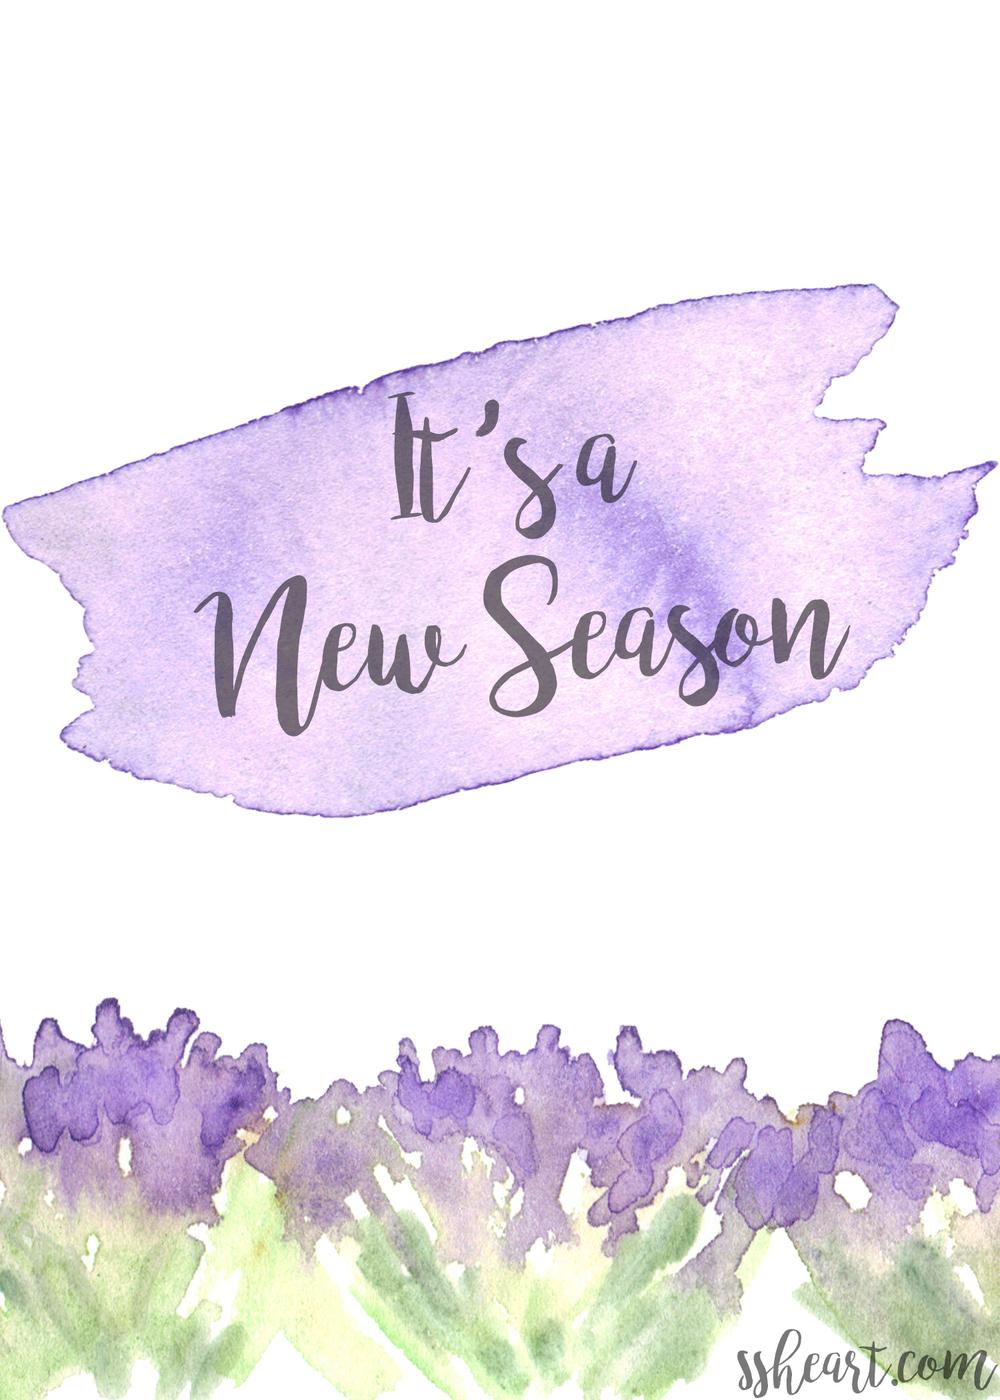 It's a New Season!!!